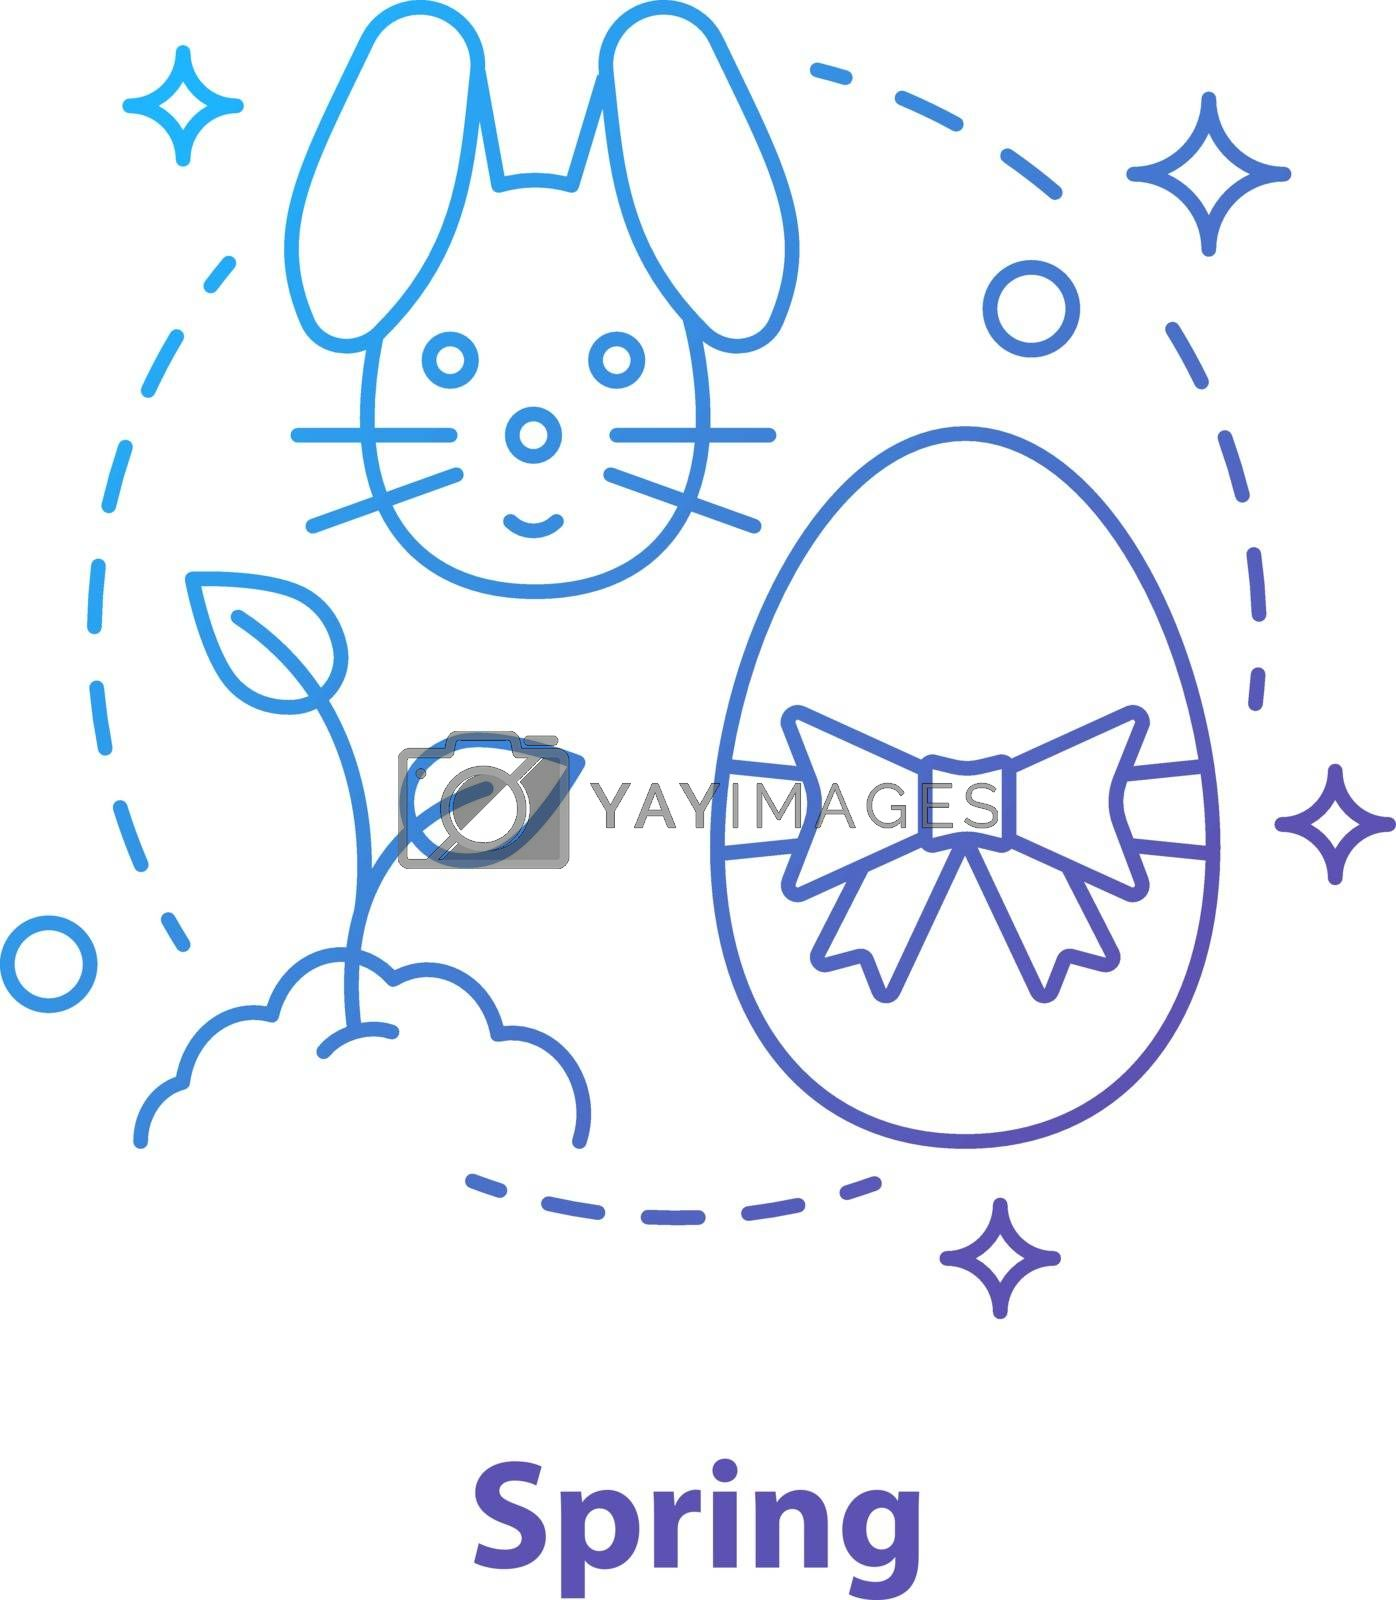 Spring season concept icon by bsd